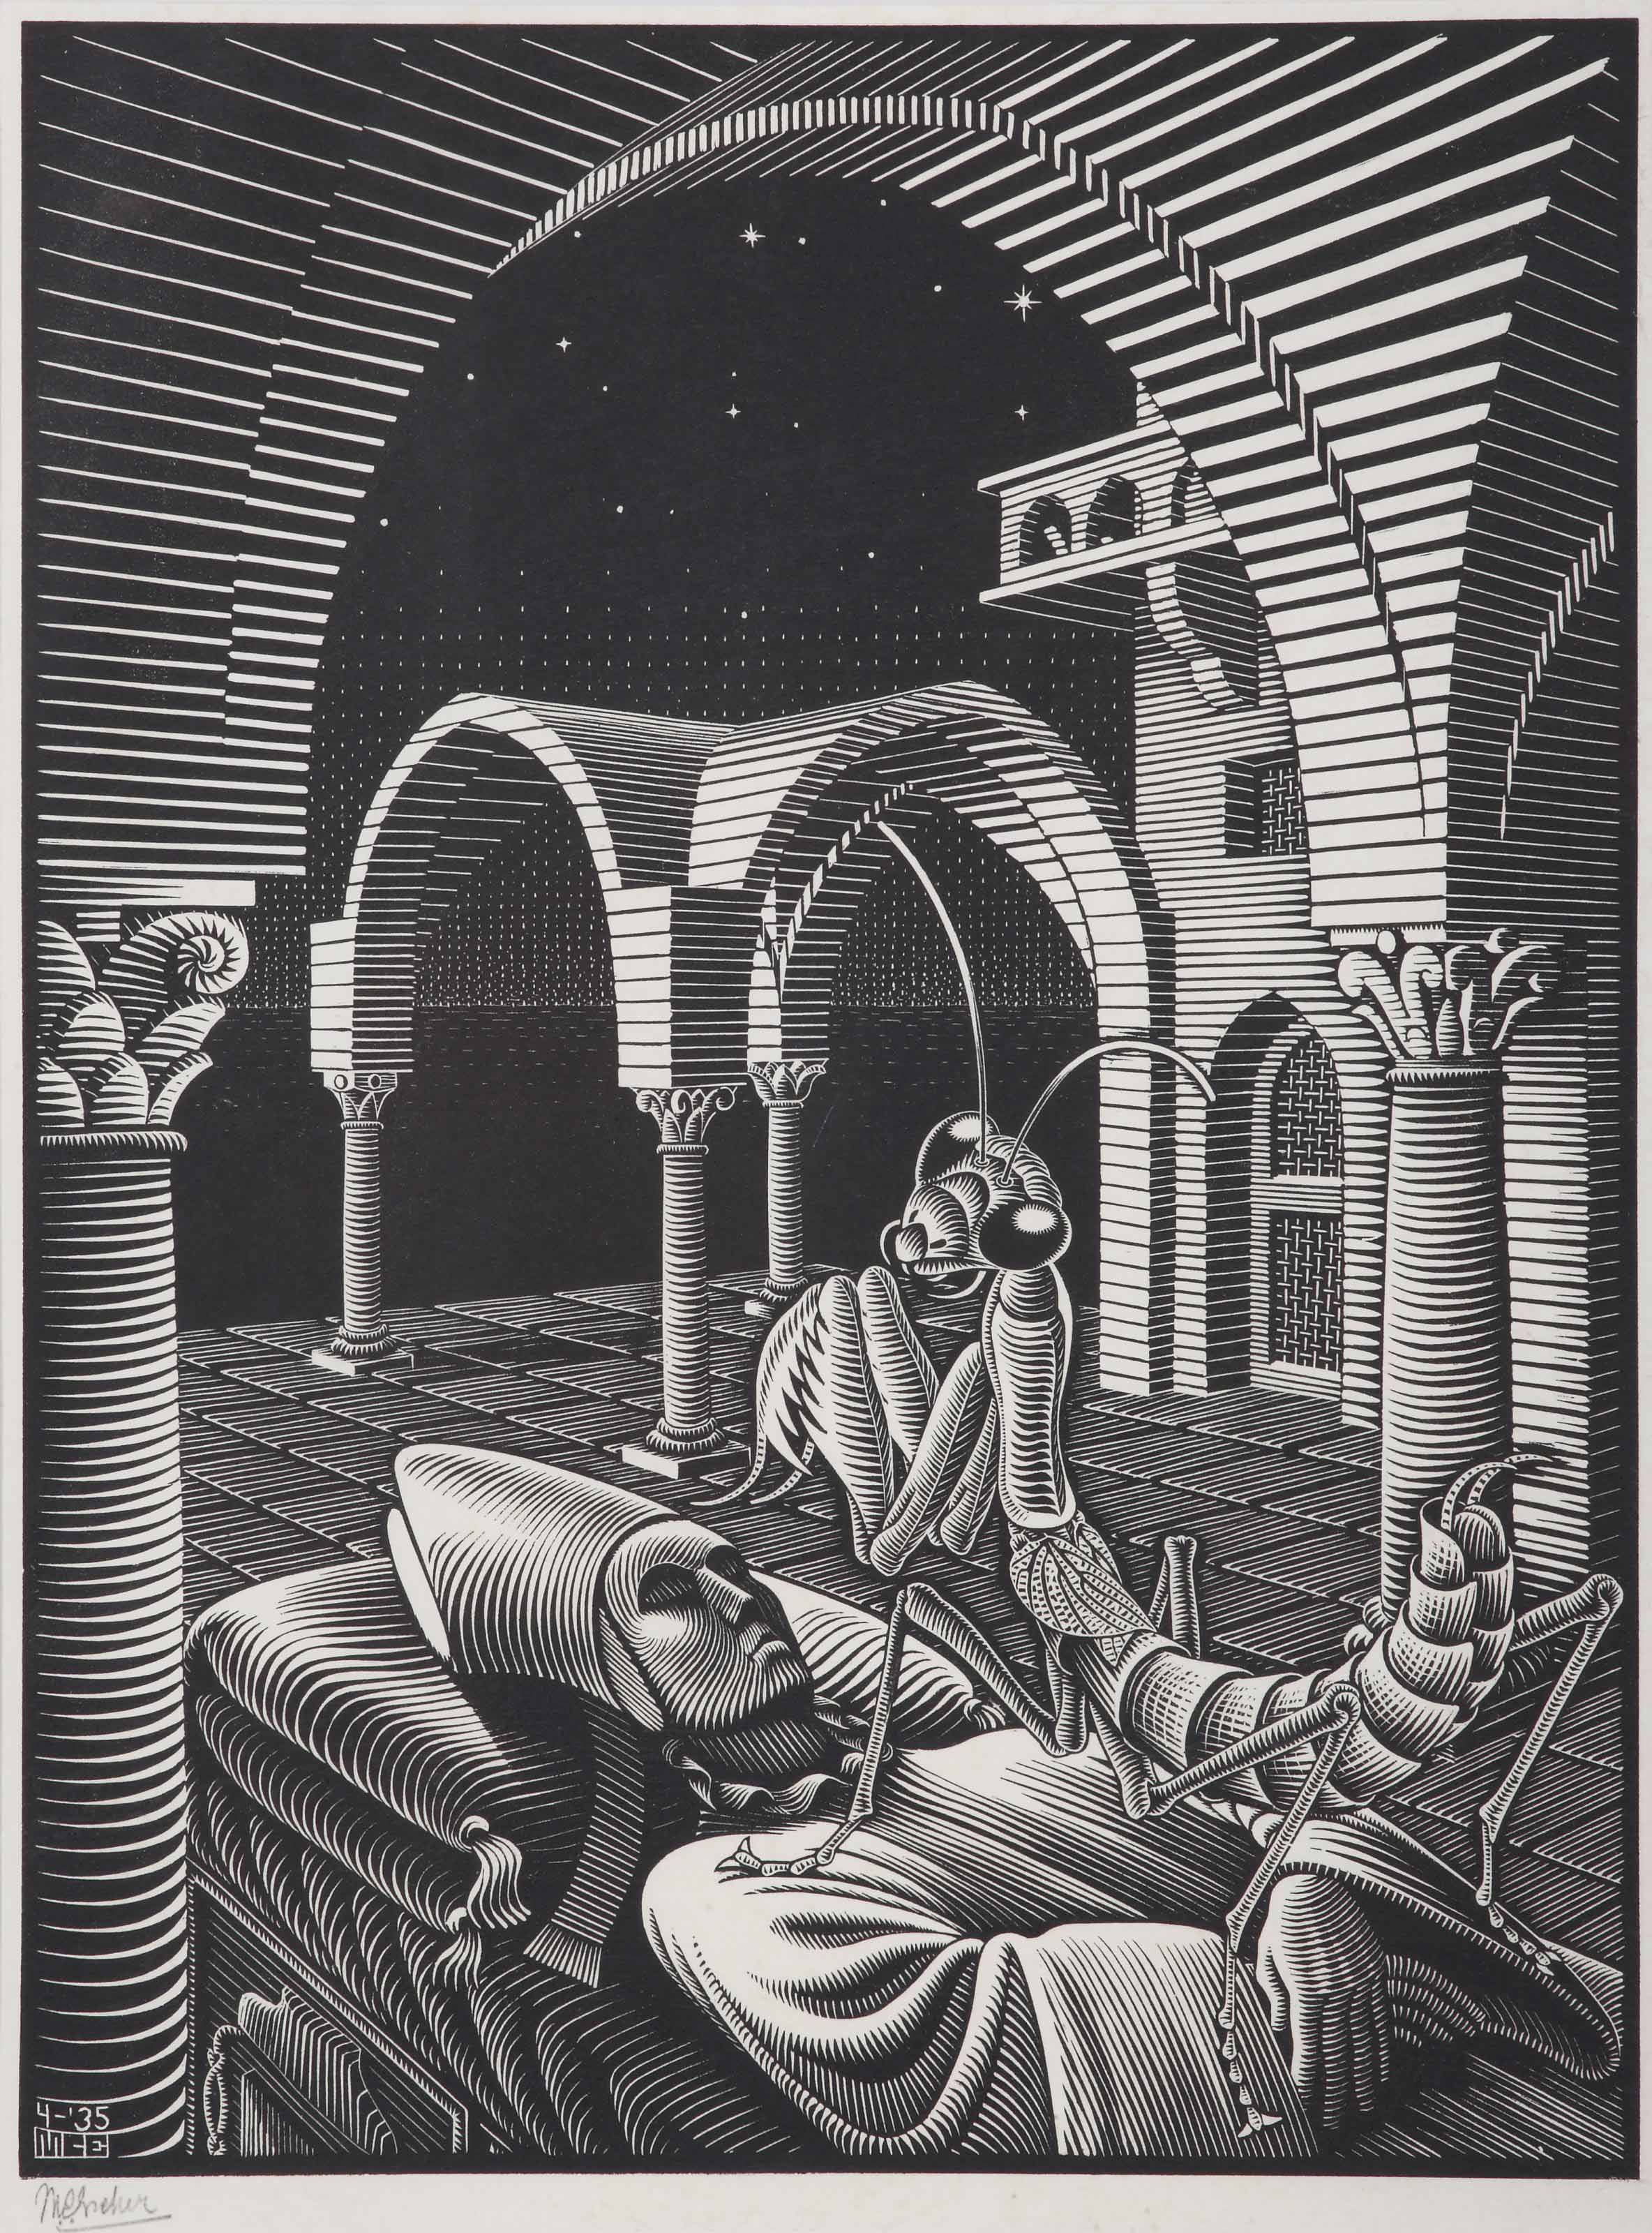 Maurits Cornelis Escher (1898-1972) | Dream (Mantis Religiosa)(B. 272) |  20th Century, Prints & Multiples | Christie's